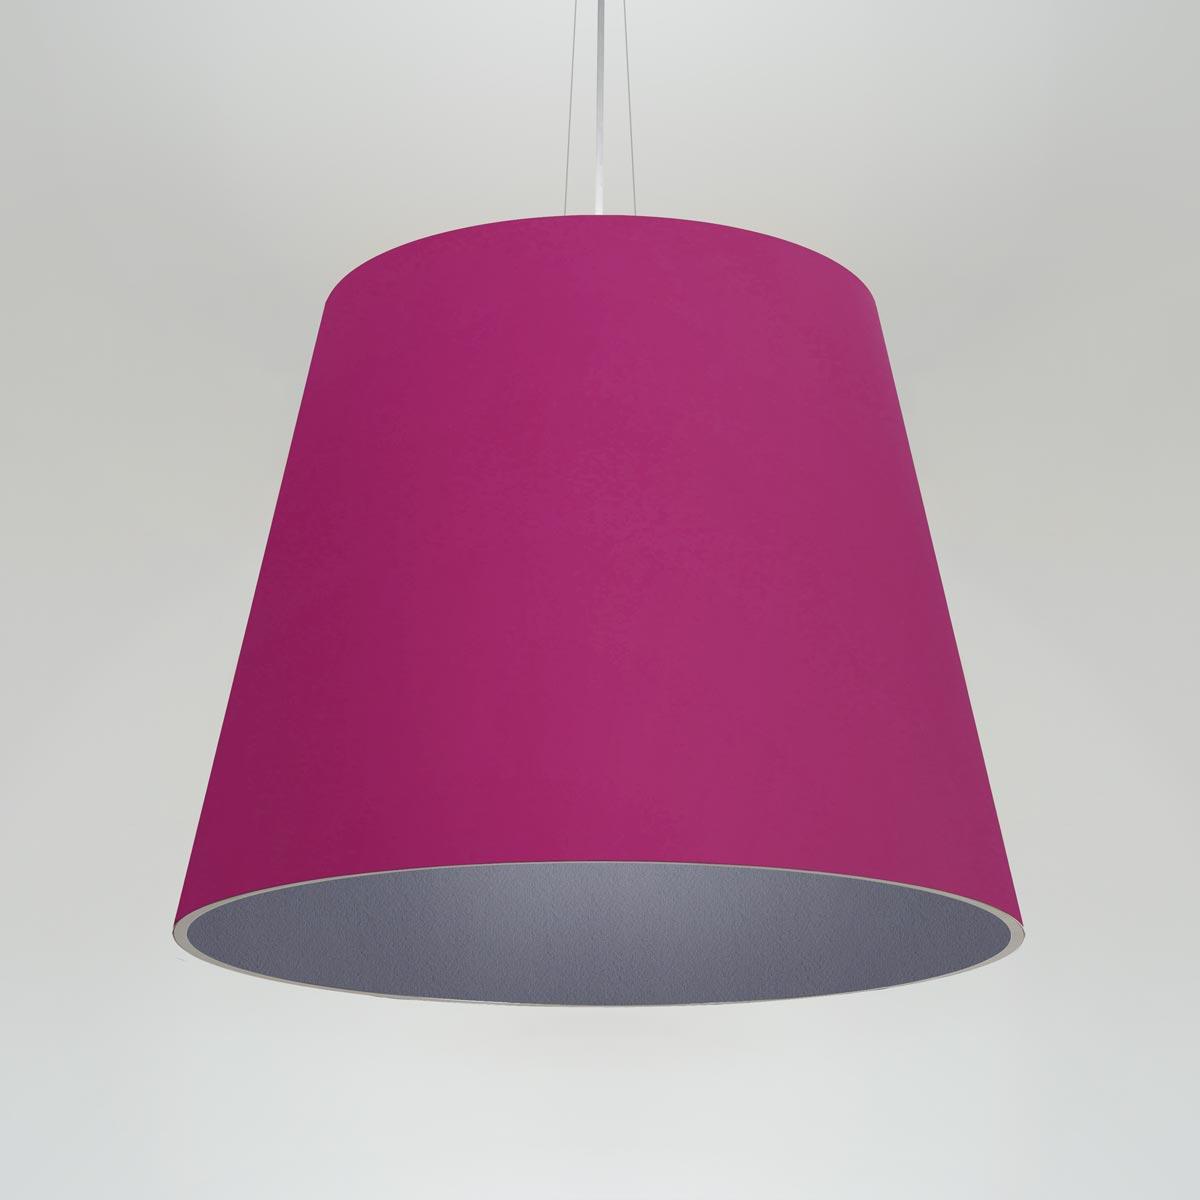 Acoustic LED pendant light. Choose acoustic, or acoustic/Lumenate® shades. Wide range of acoustic and Lumenate® colors/patterns.